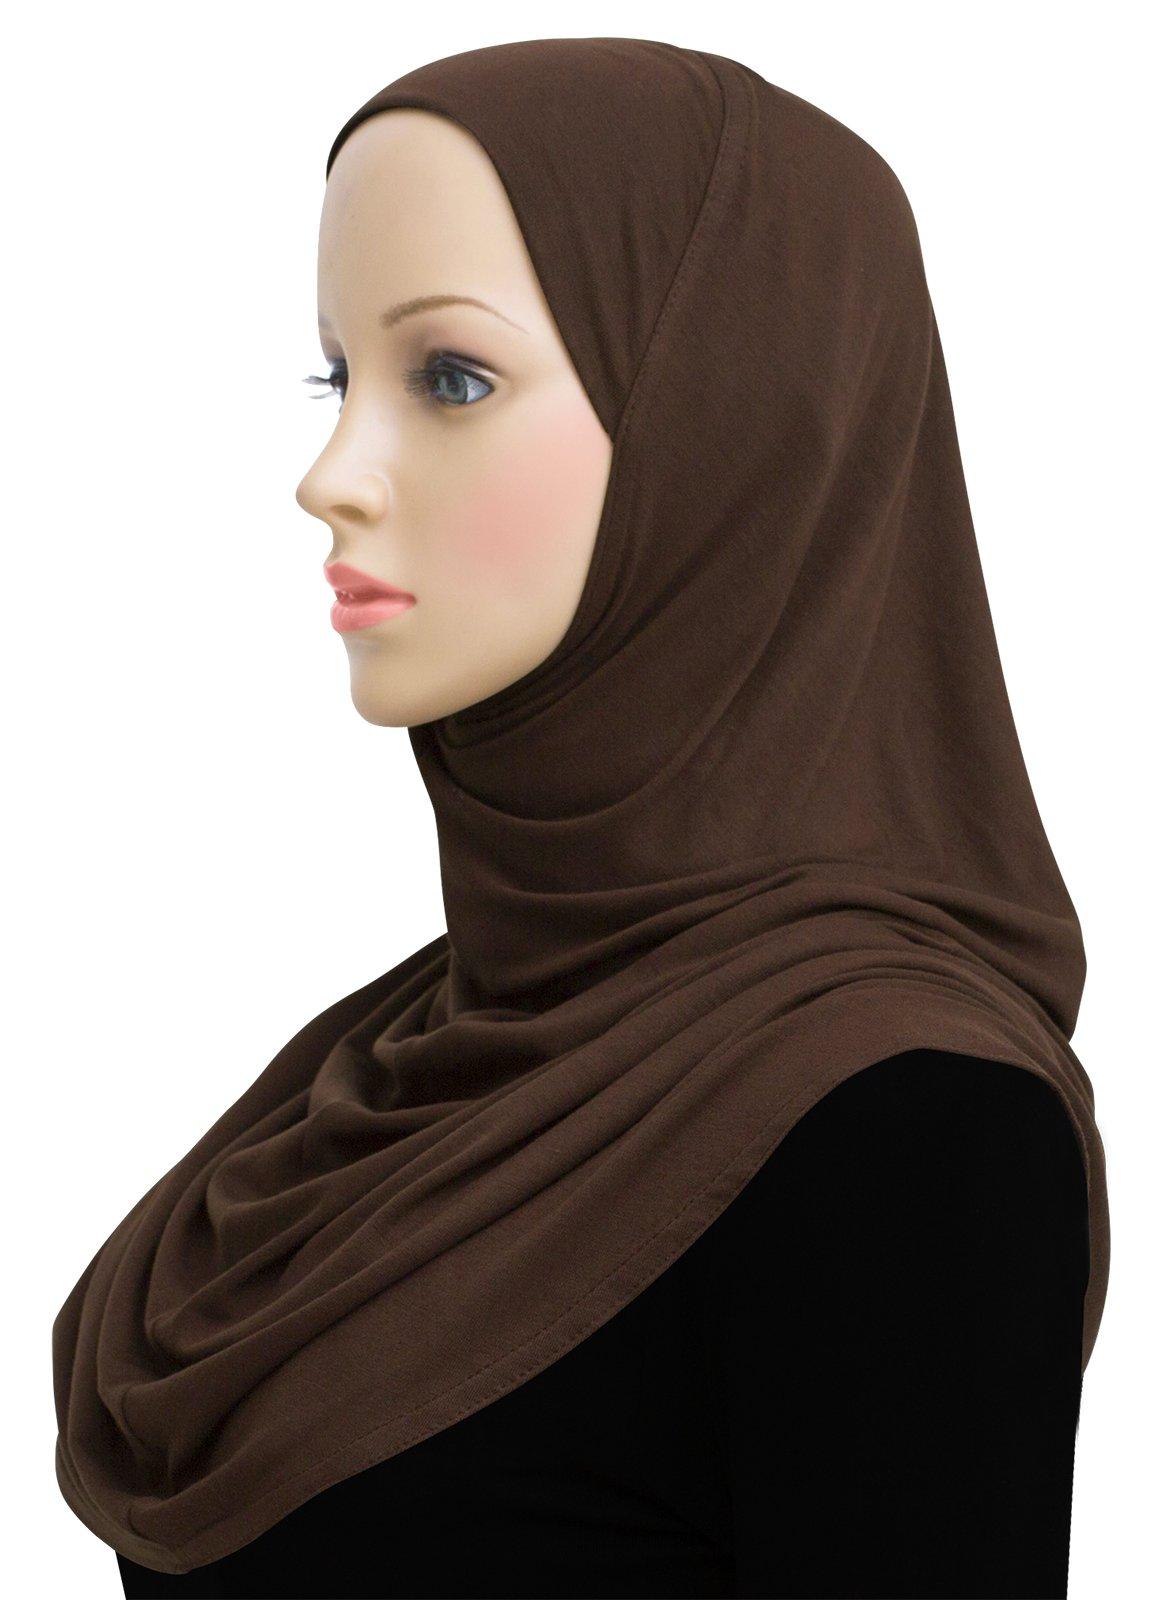 Cotton Hijab 1 piece Khatib Amira Head Scarf (Brown)